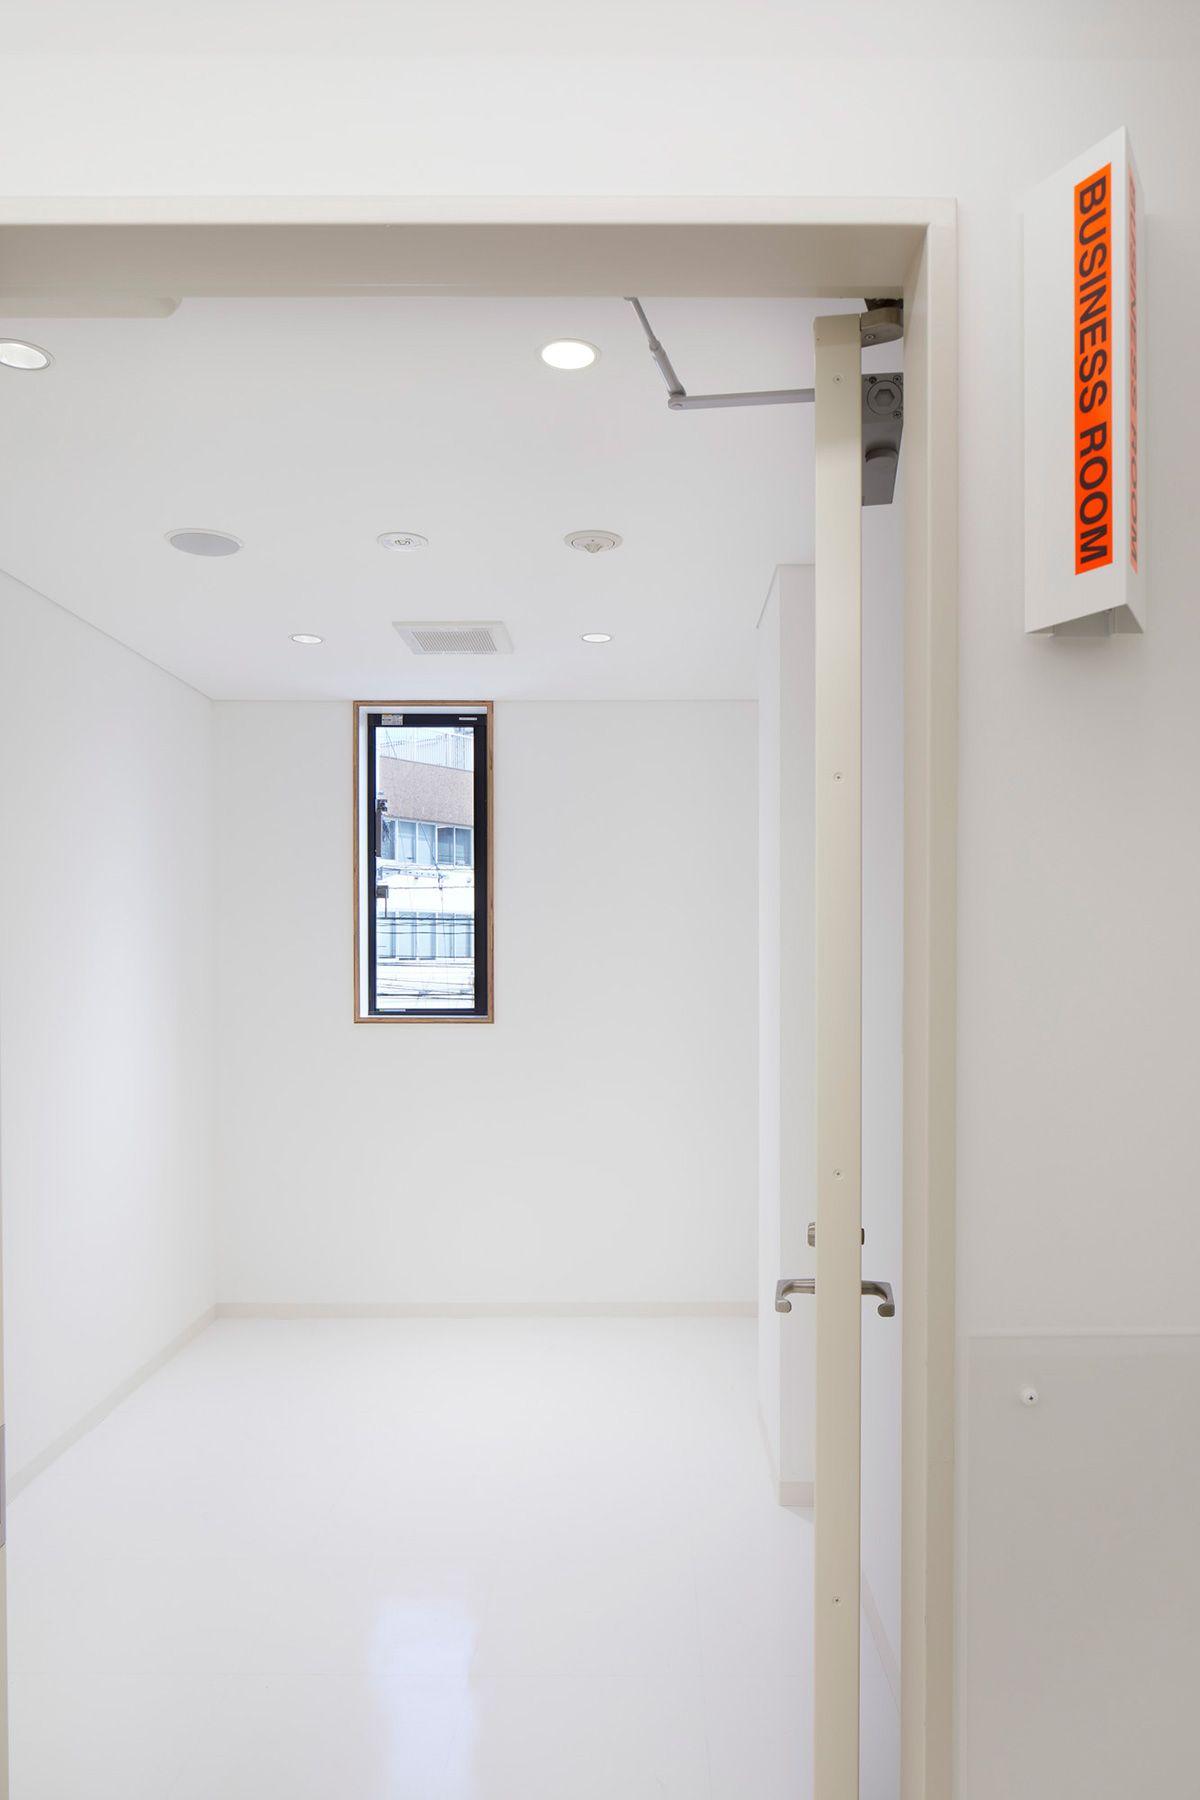 MUSTARD™️ HOTEL SHIBUYA (マスタードホテル シブヤ)客室階 蛍光色のサイン